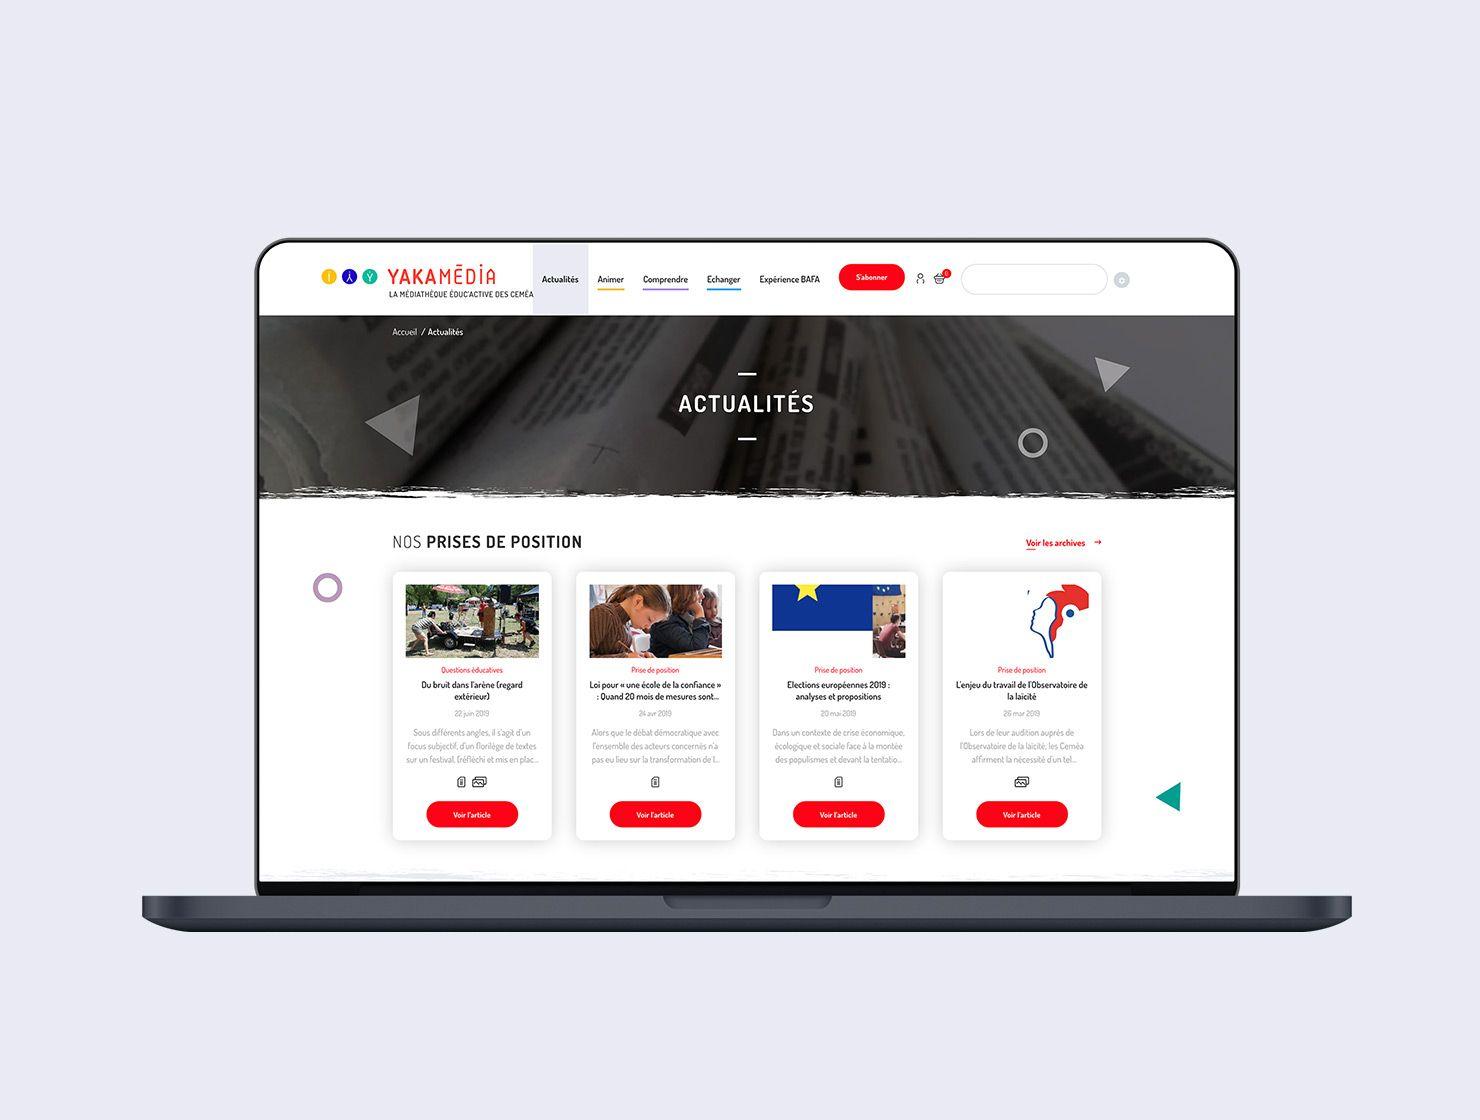 YAKAMÉDIA par Agence Web Kernix